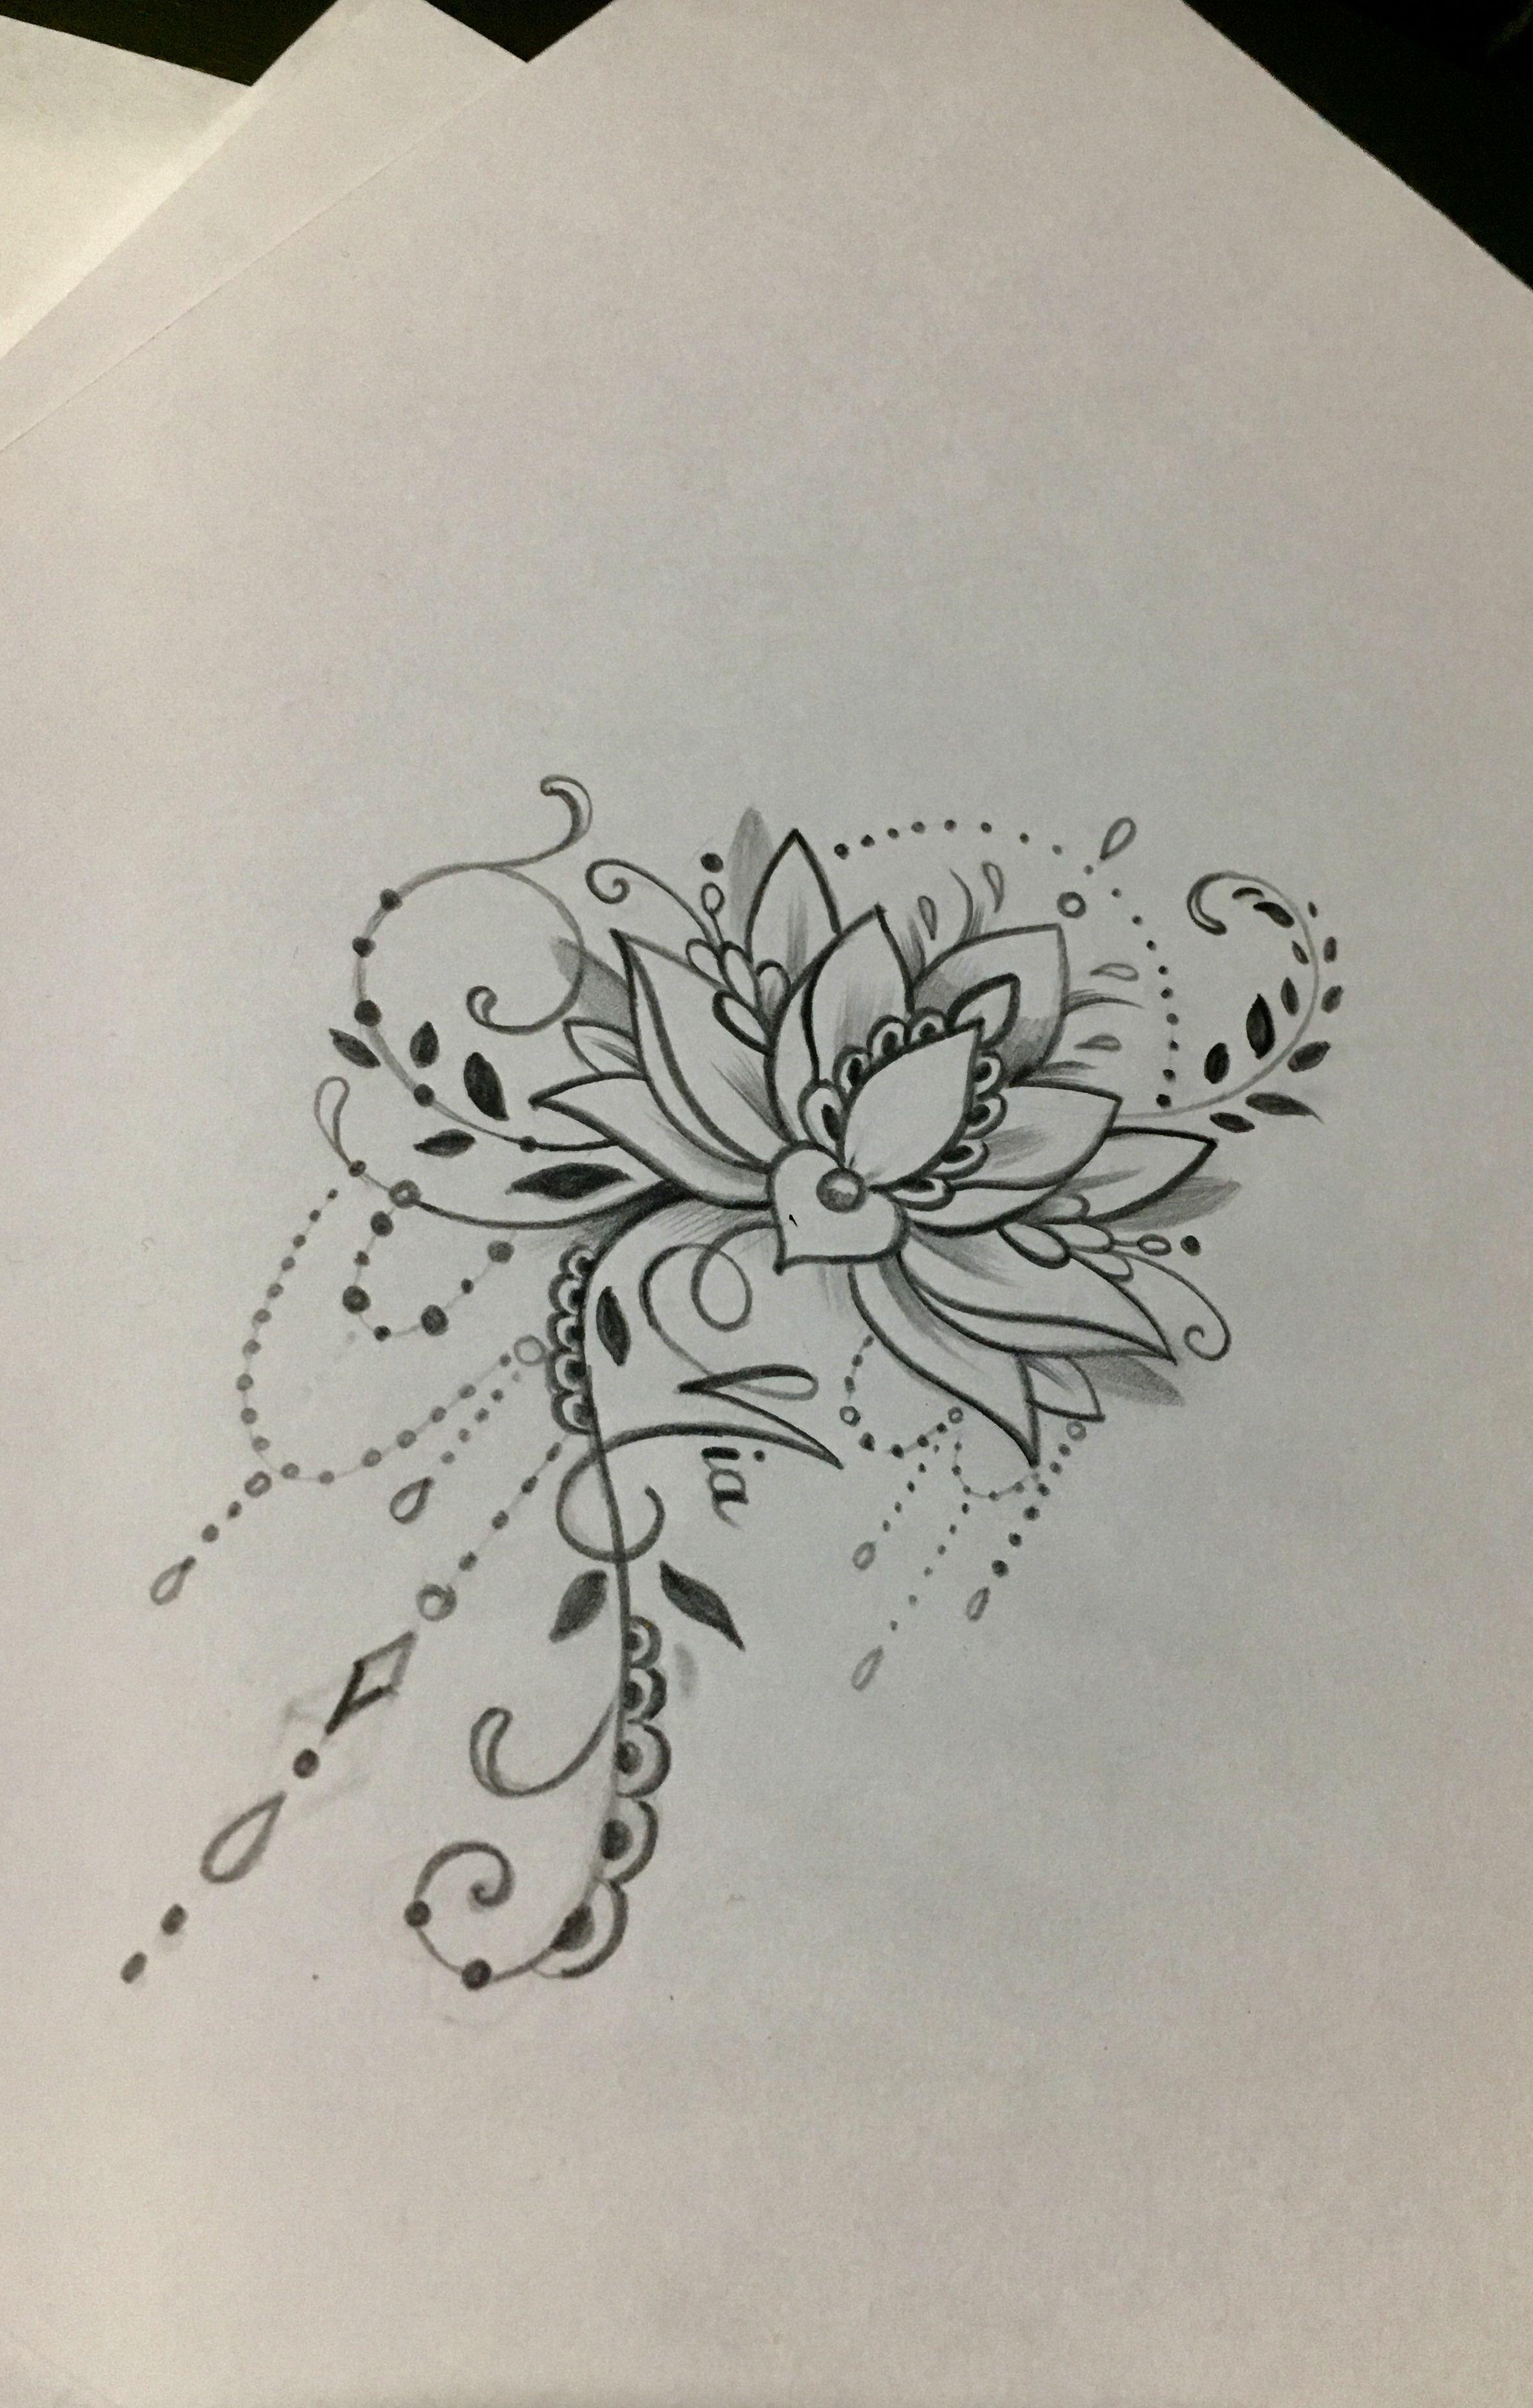 Pin By Danielle Chrisstahl On Tatuaggi Lotus Mandala Tattoo Rose Tattoos Tattoos